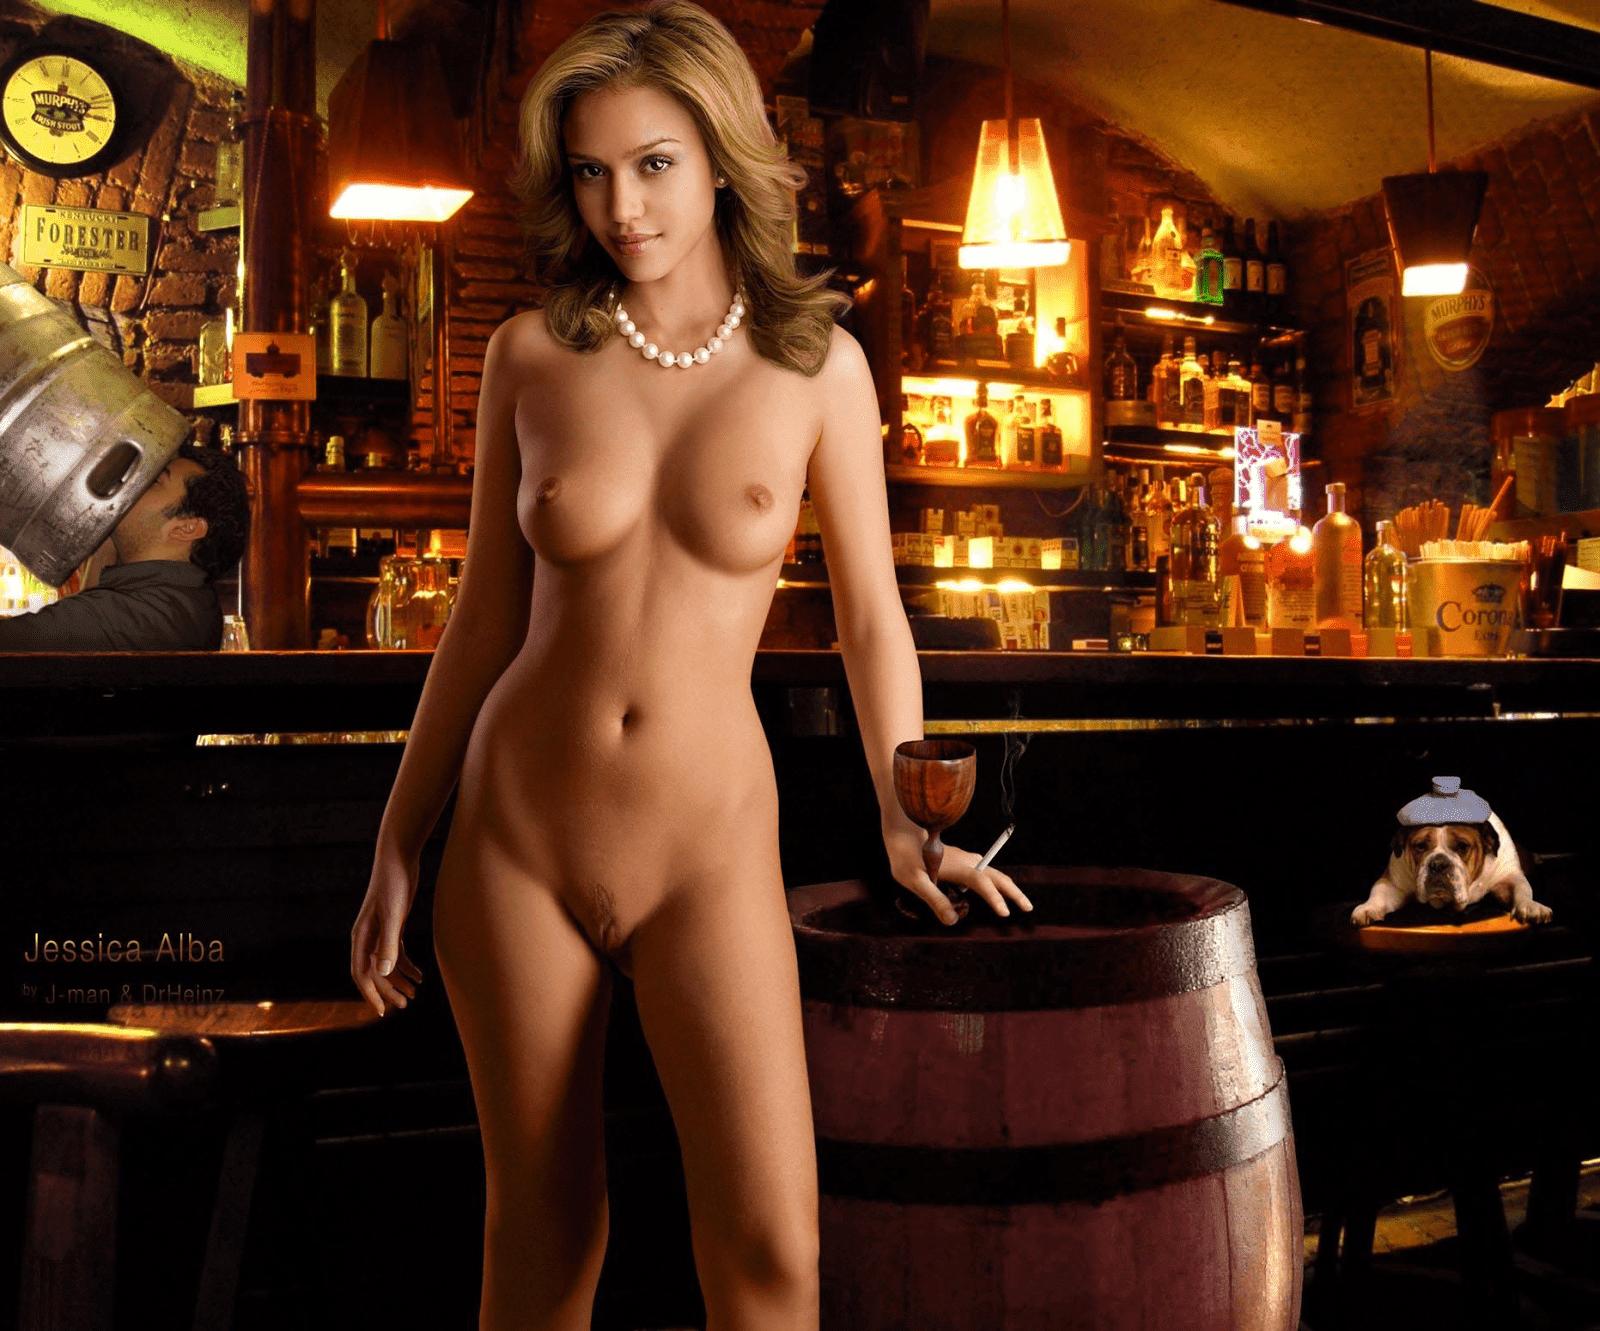 Jessica alba nude pussy